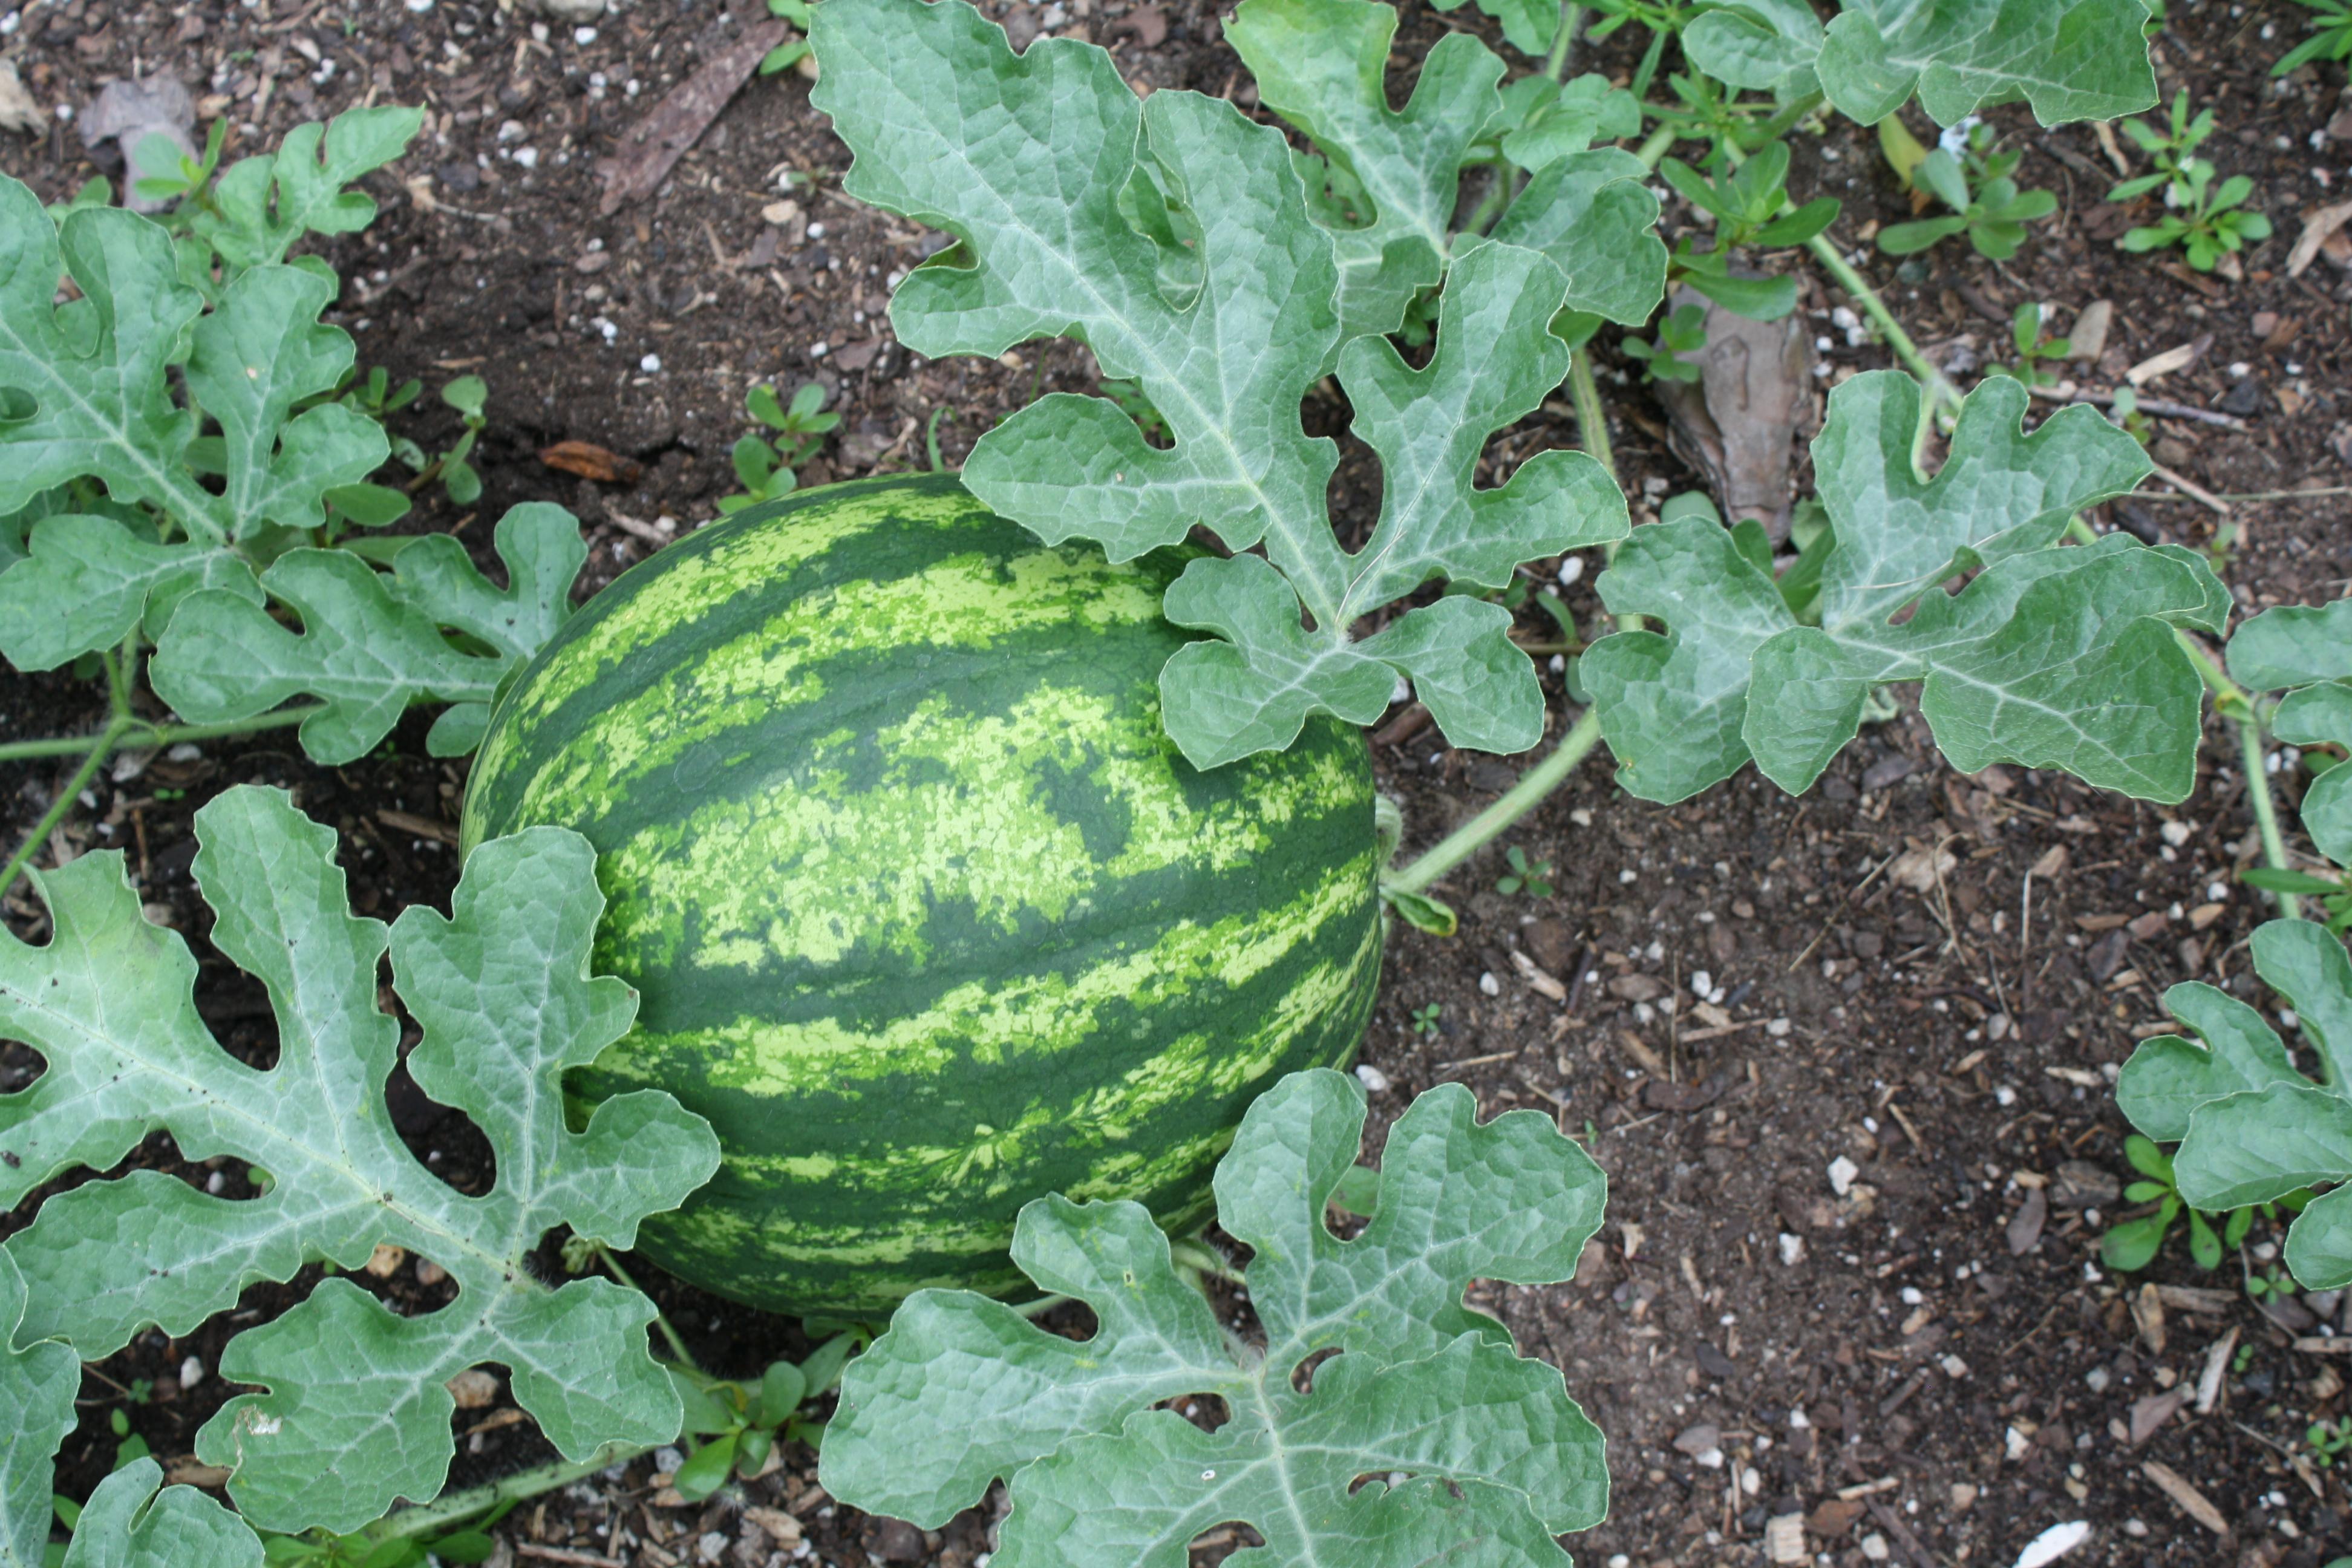 Watermelon Vine Watermelon on vineWatermelons On The Vine